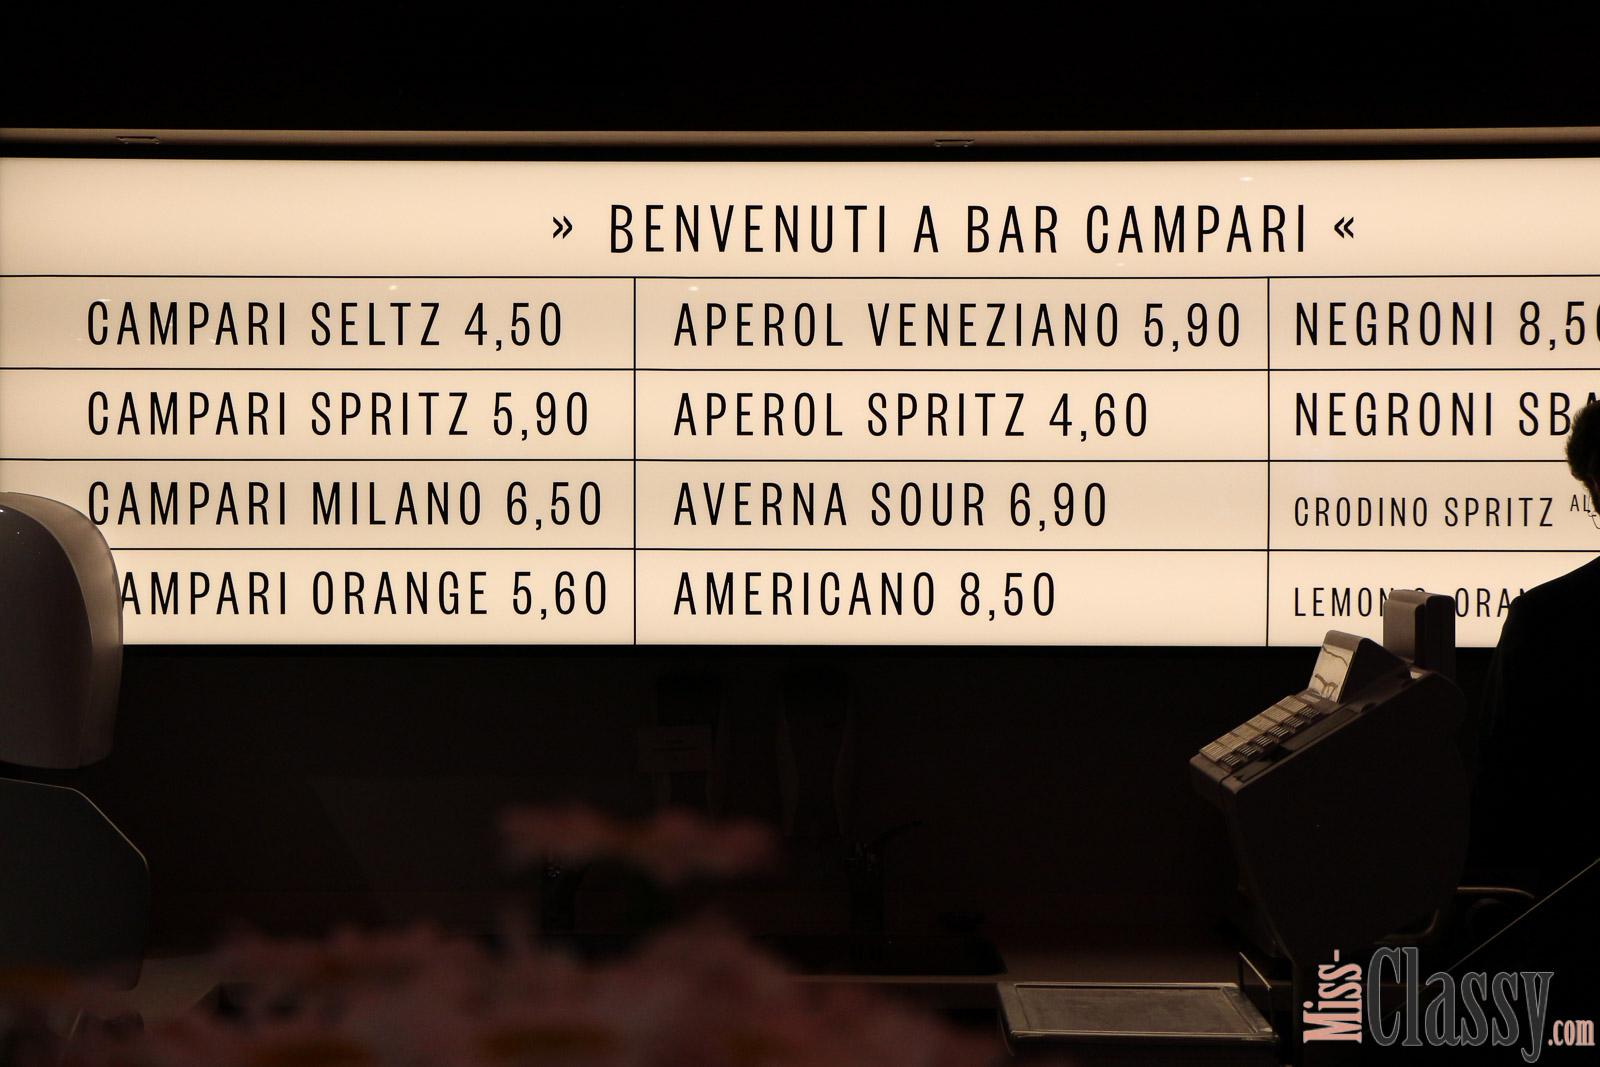 LIFESTYLE Bar Campari im Frankowitsch in Graz, Miss Classy, VIP Opening, Campari Orange, Campari Seltz, Aperitivo, Graz, Delikatessen, Brötchen, Patisserie